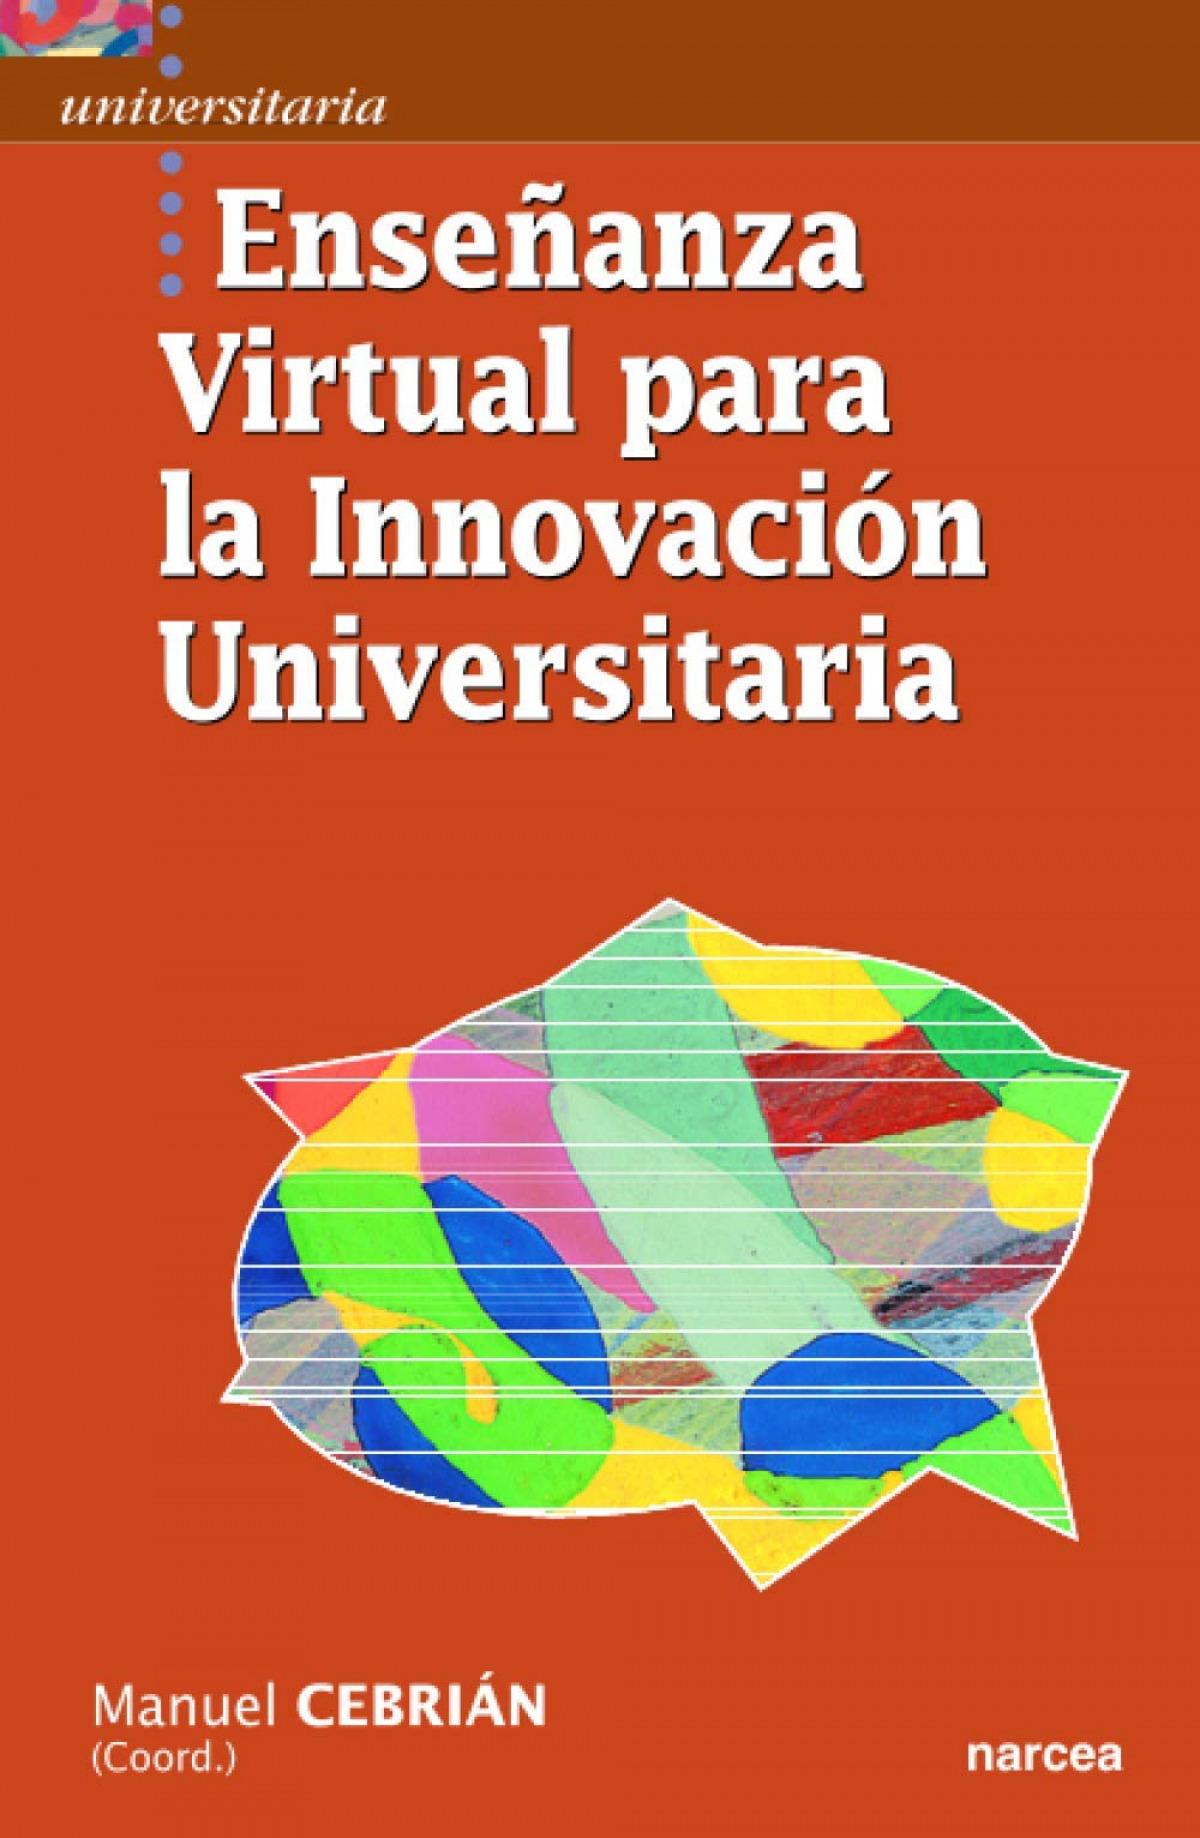 Enseñanza virtual para innovación unviersitaria